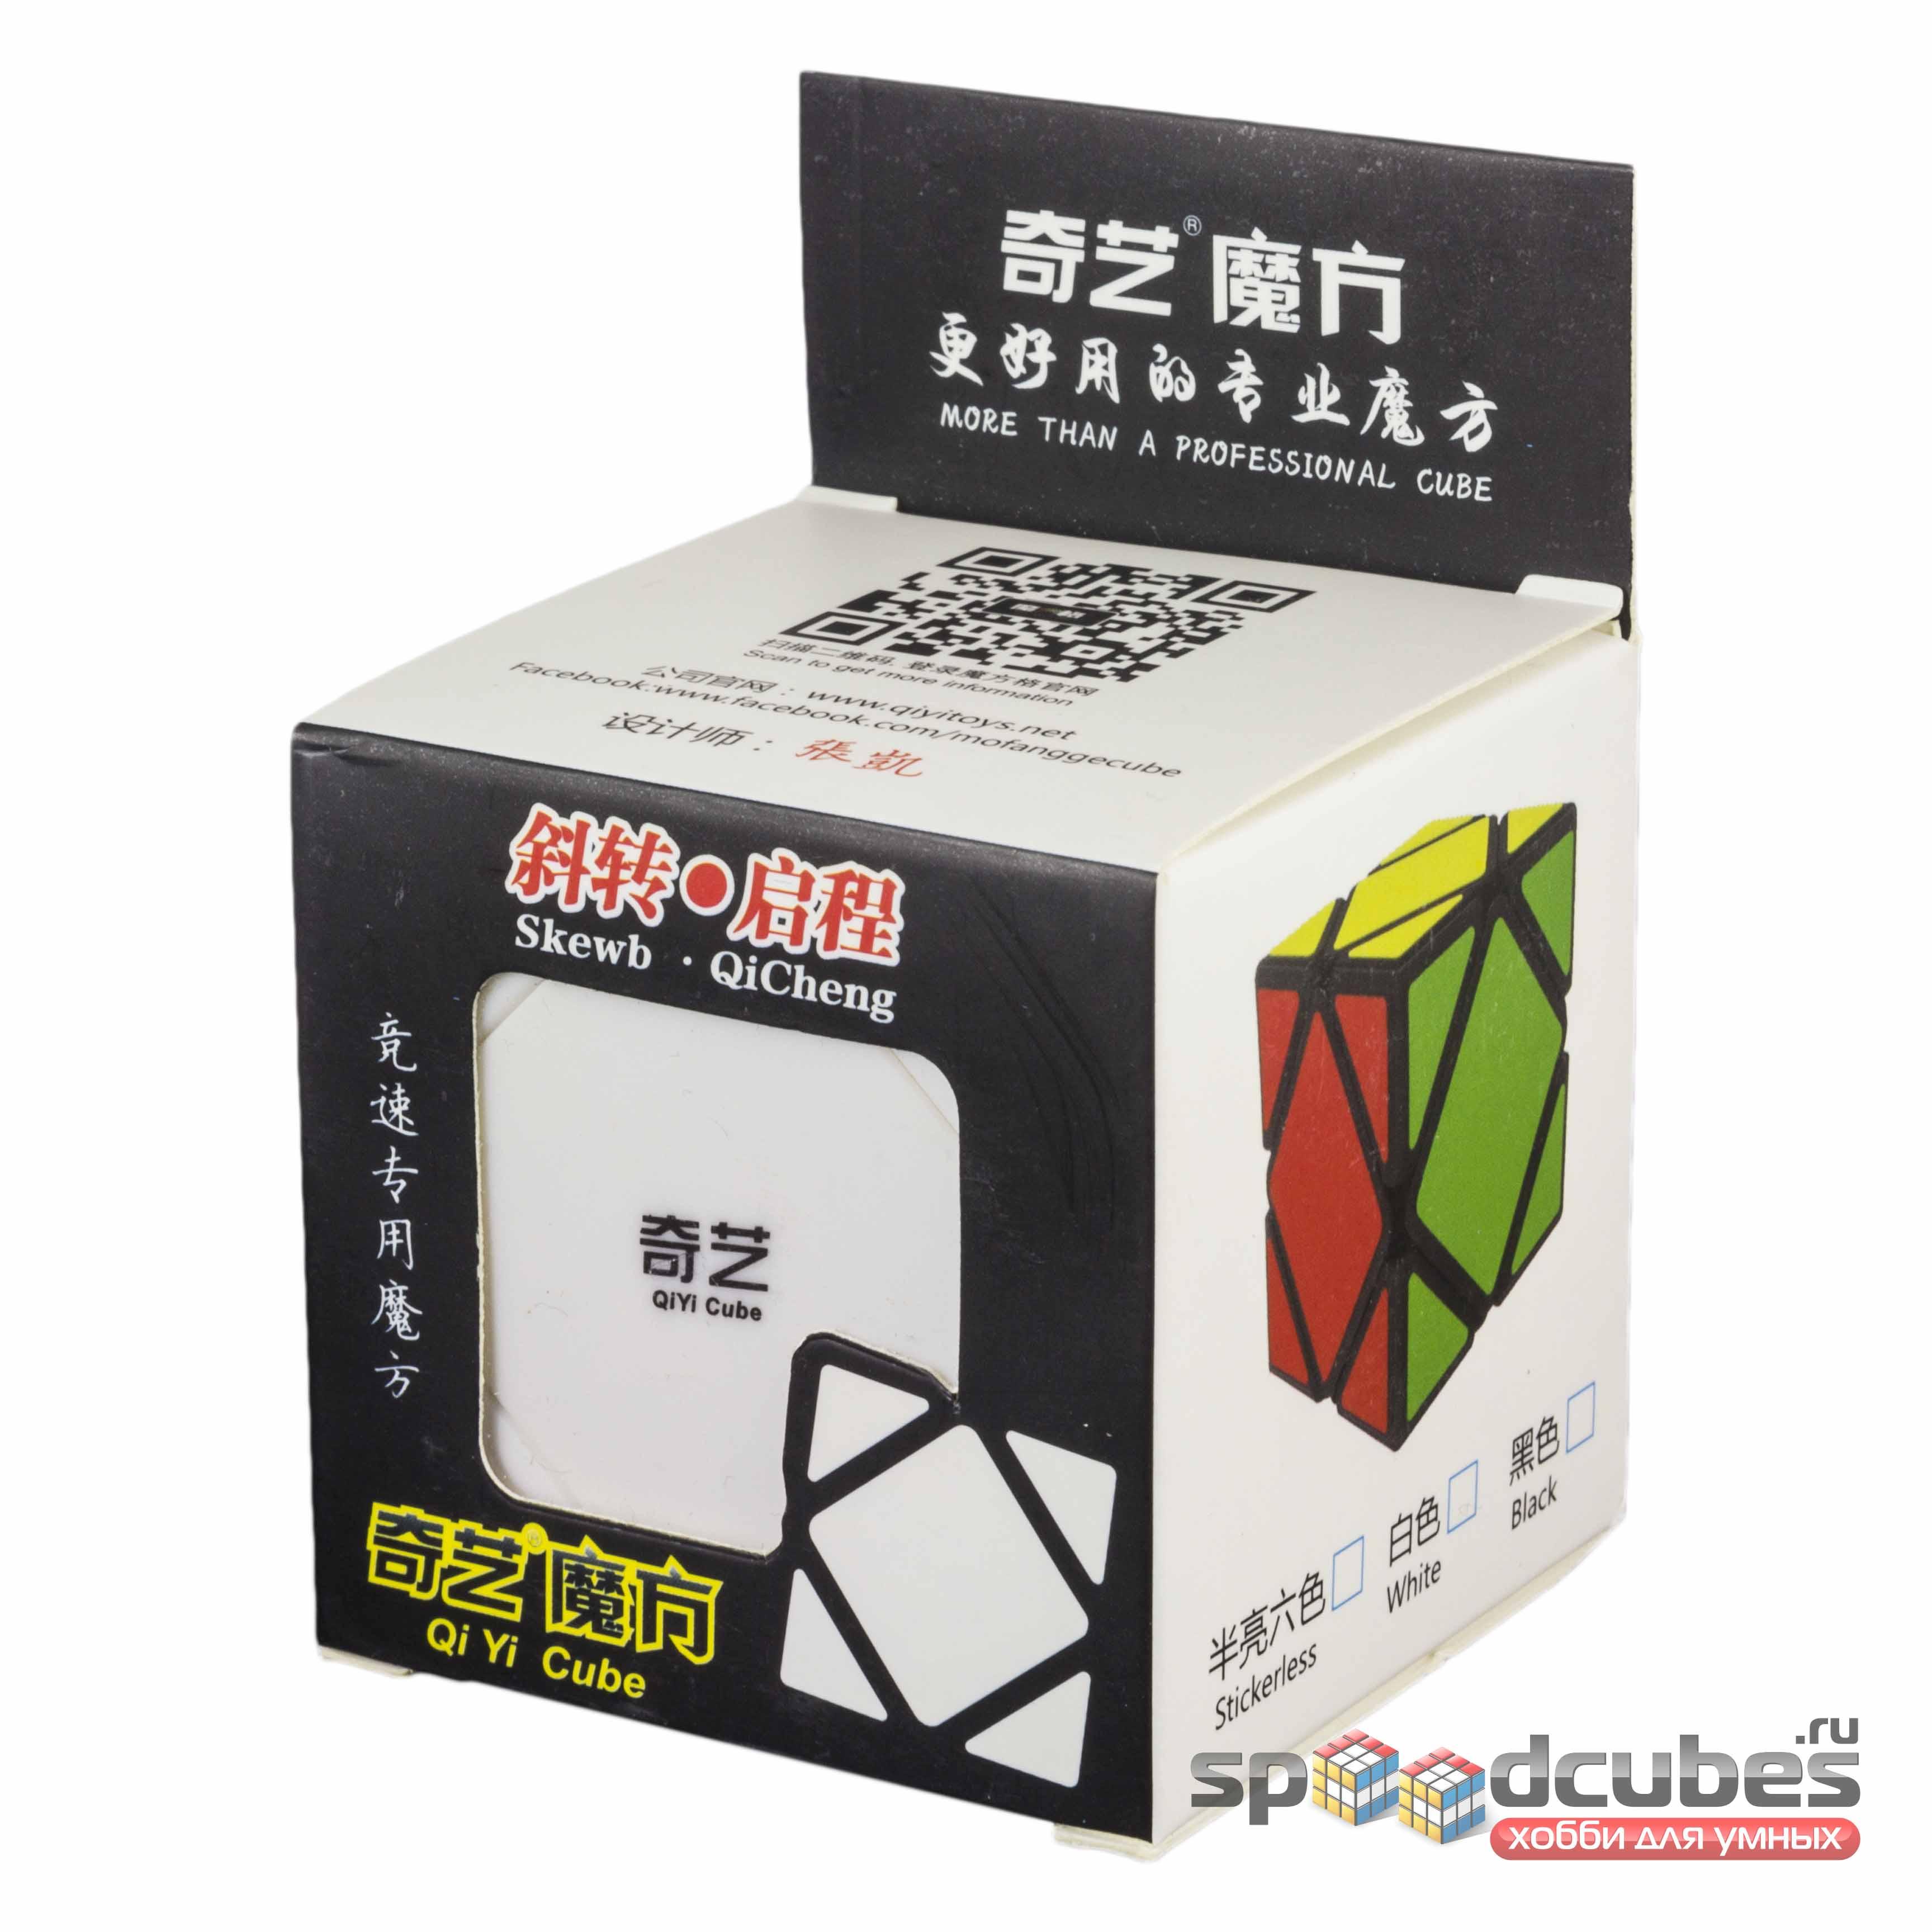 QiYi (MoFangGe) Qicheng Skewb Color 1